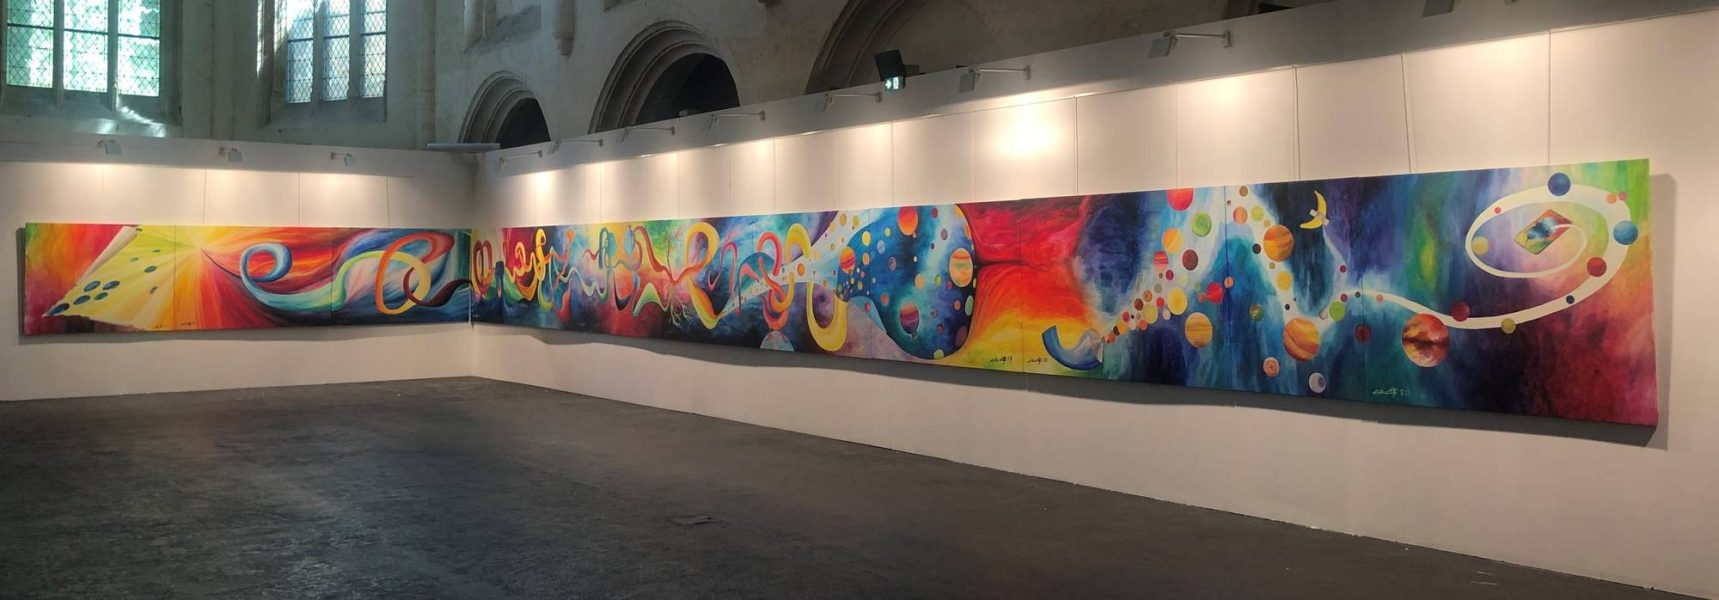 Crann Piorr'Art - Colournoscopy - Saint-Rémi